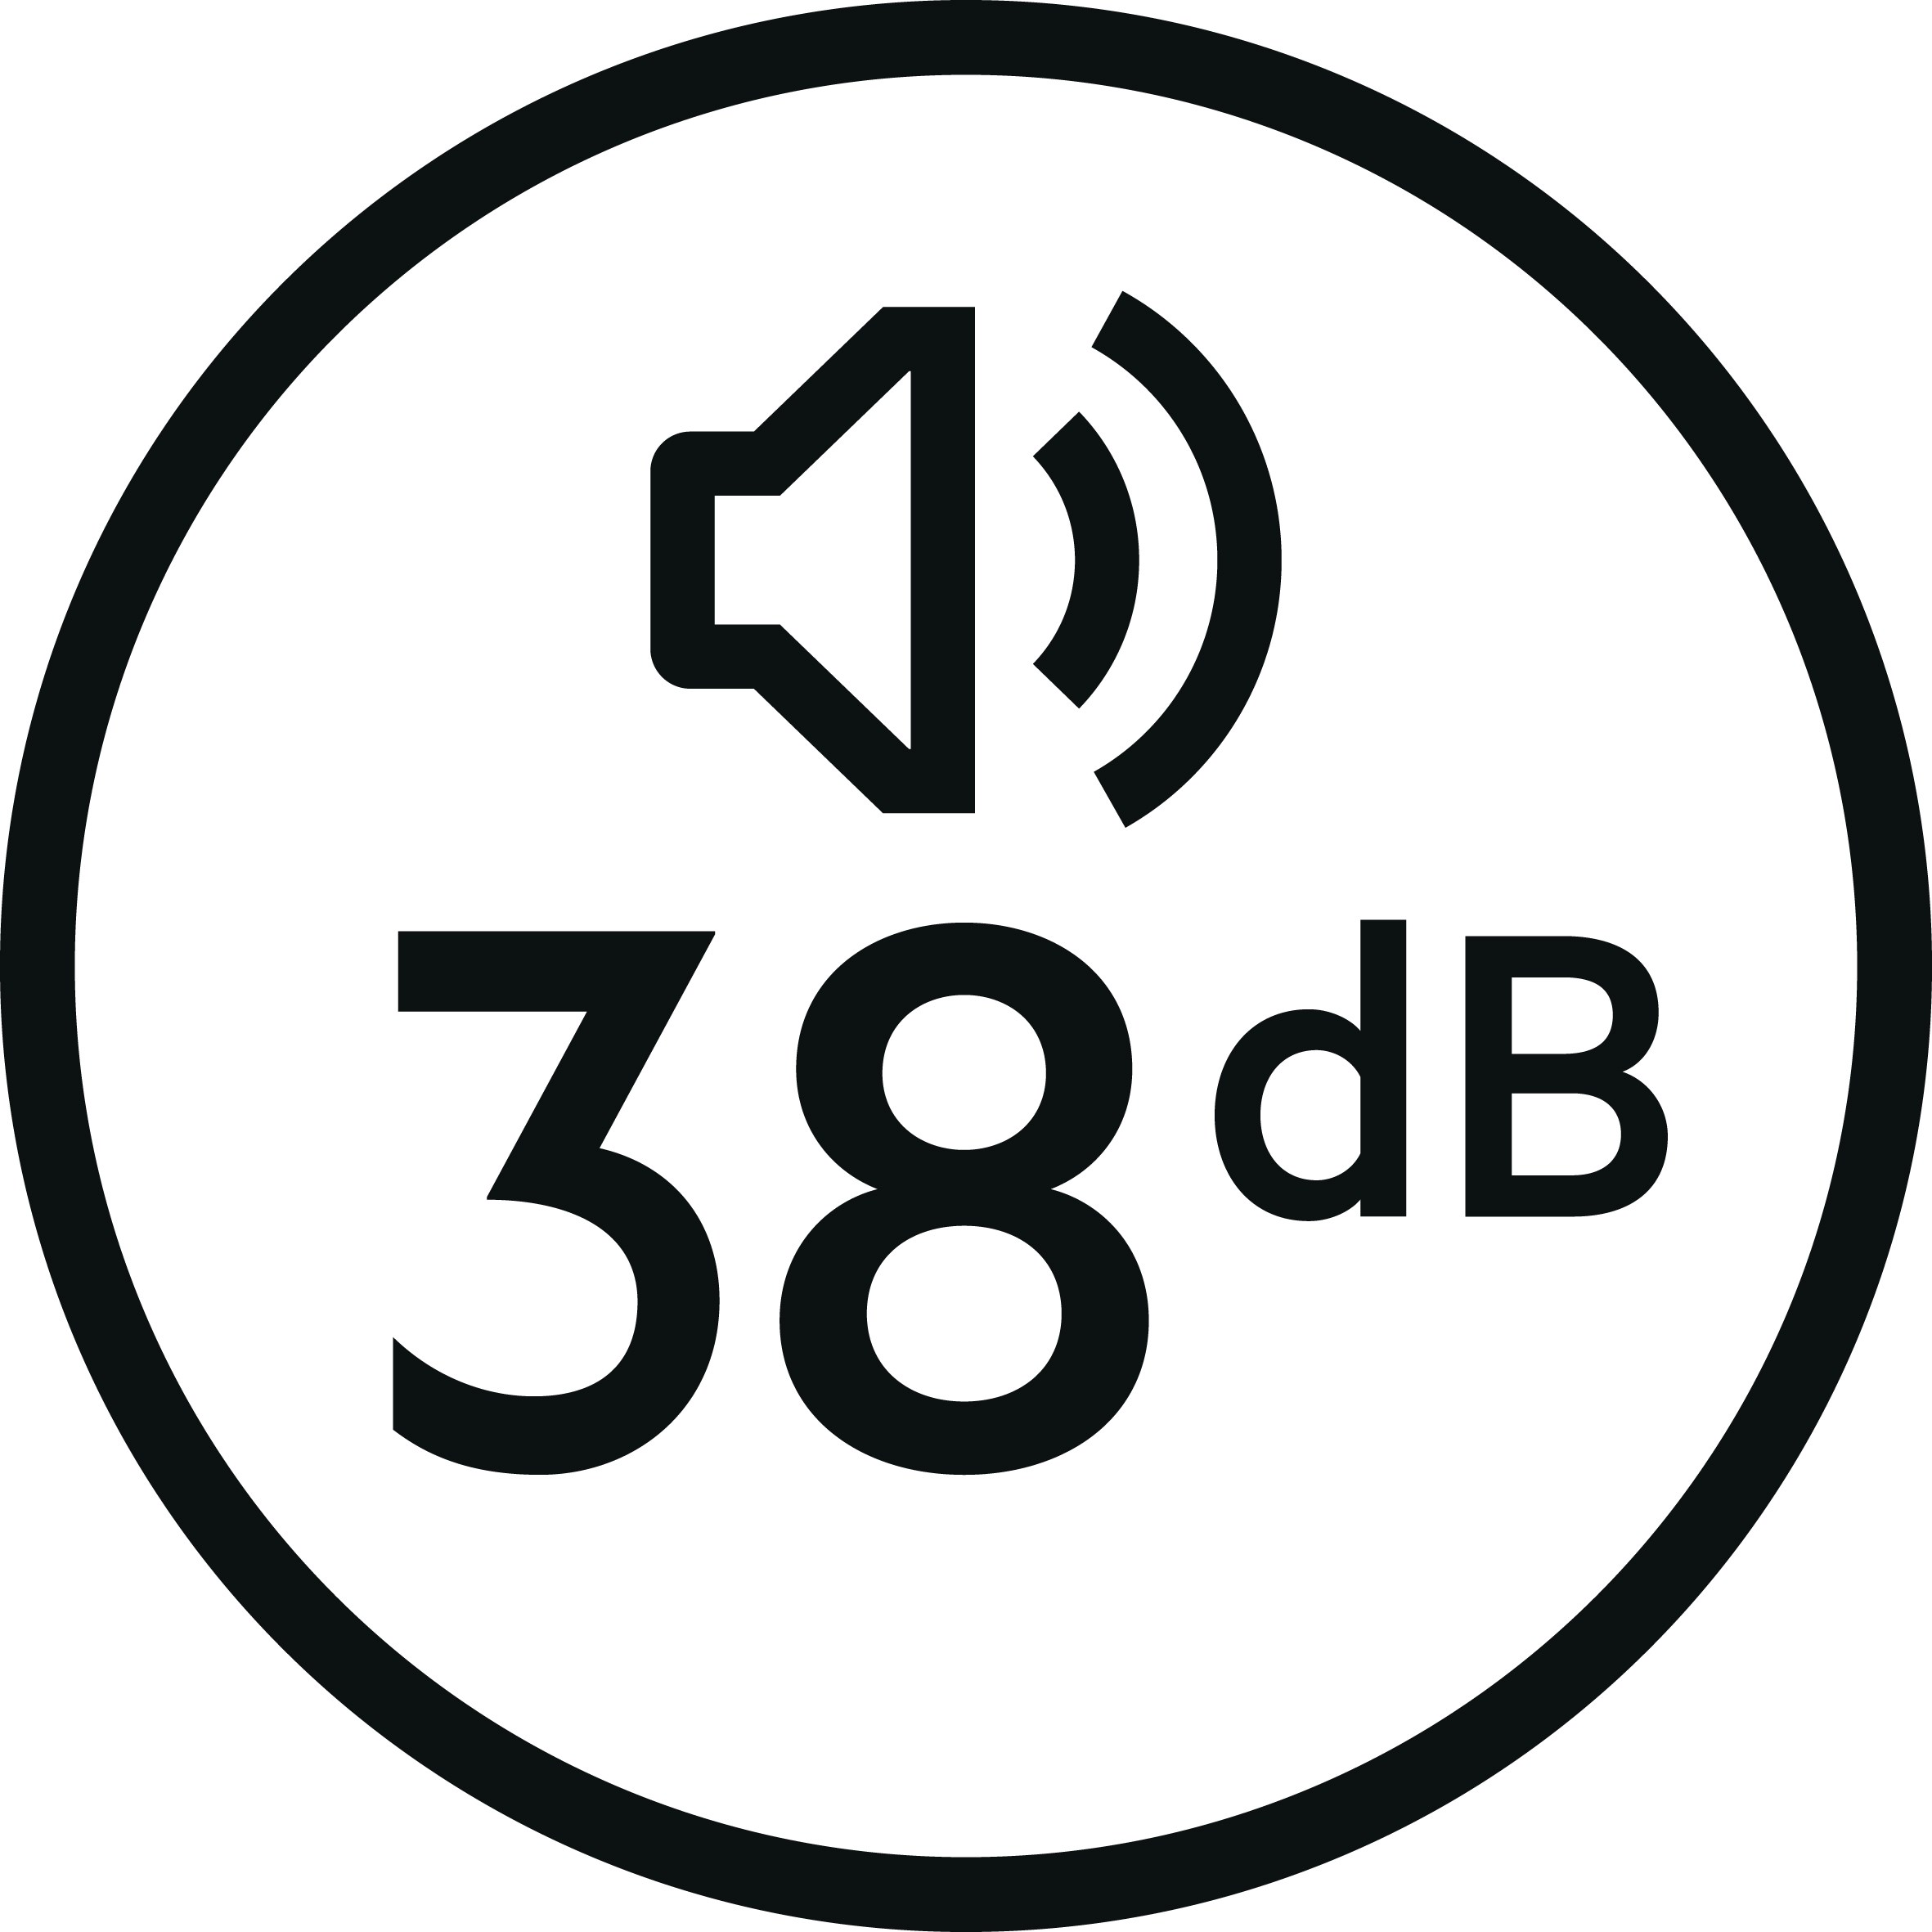 38dB-PSAAAP16PC569053.jpg